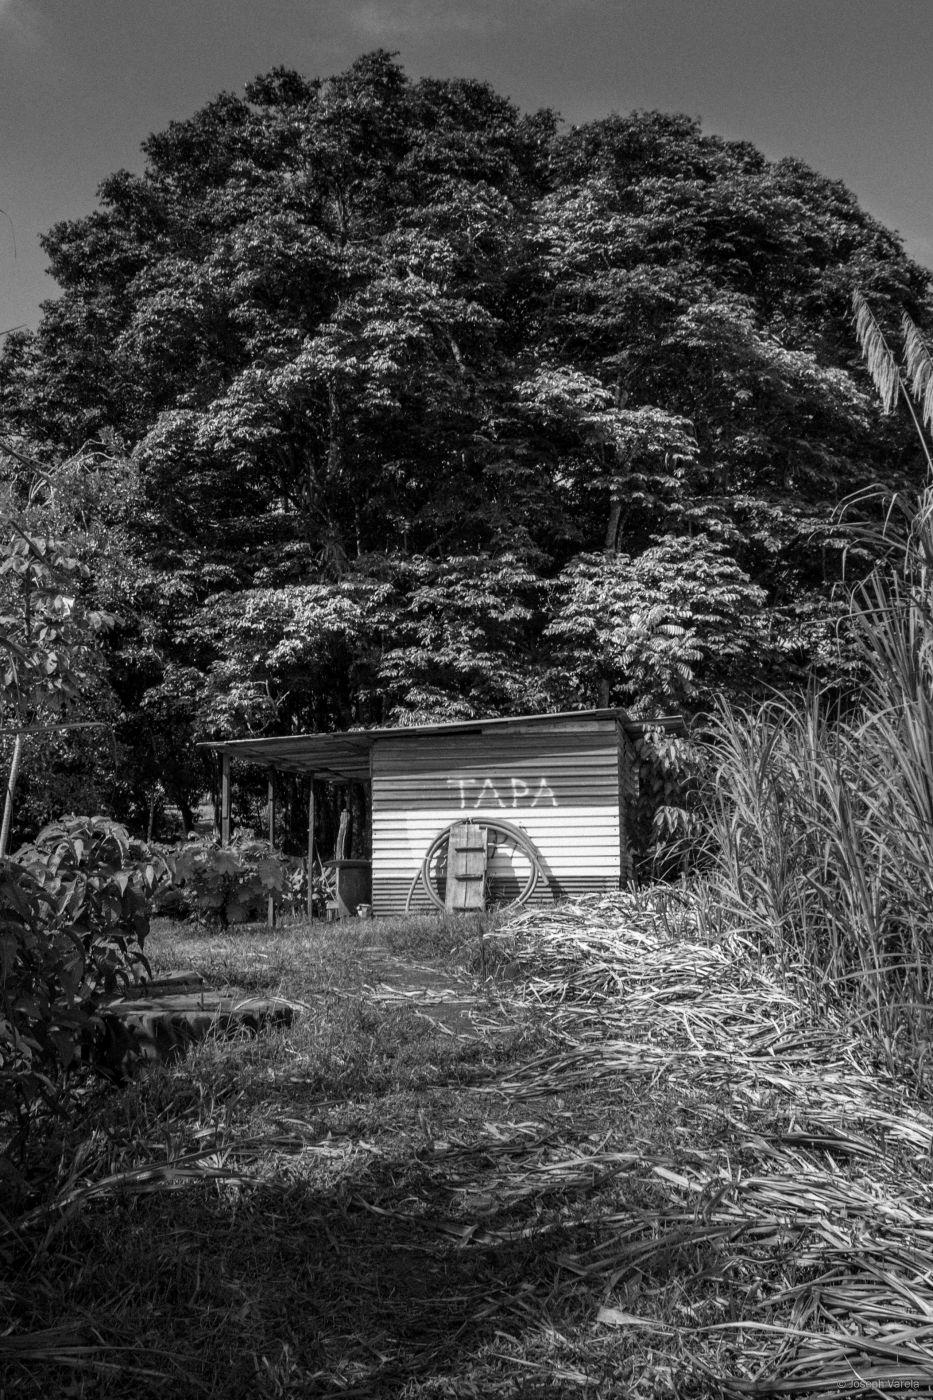 San Carlos, Costa Rica